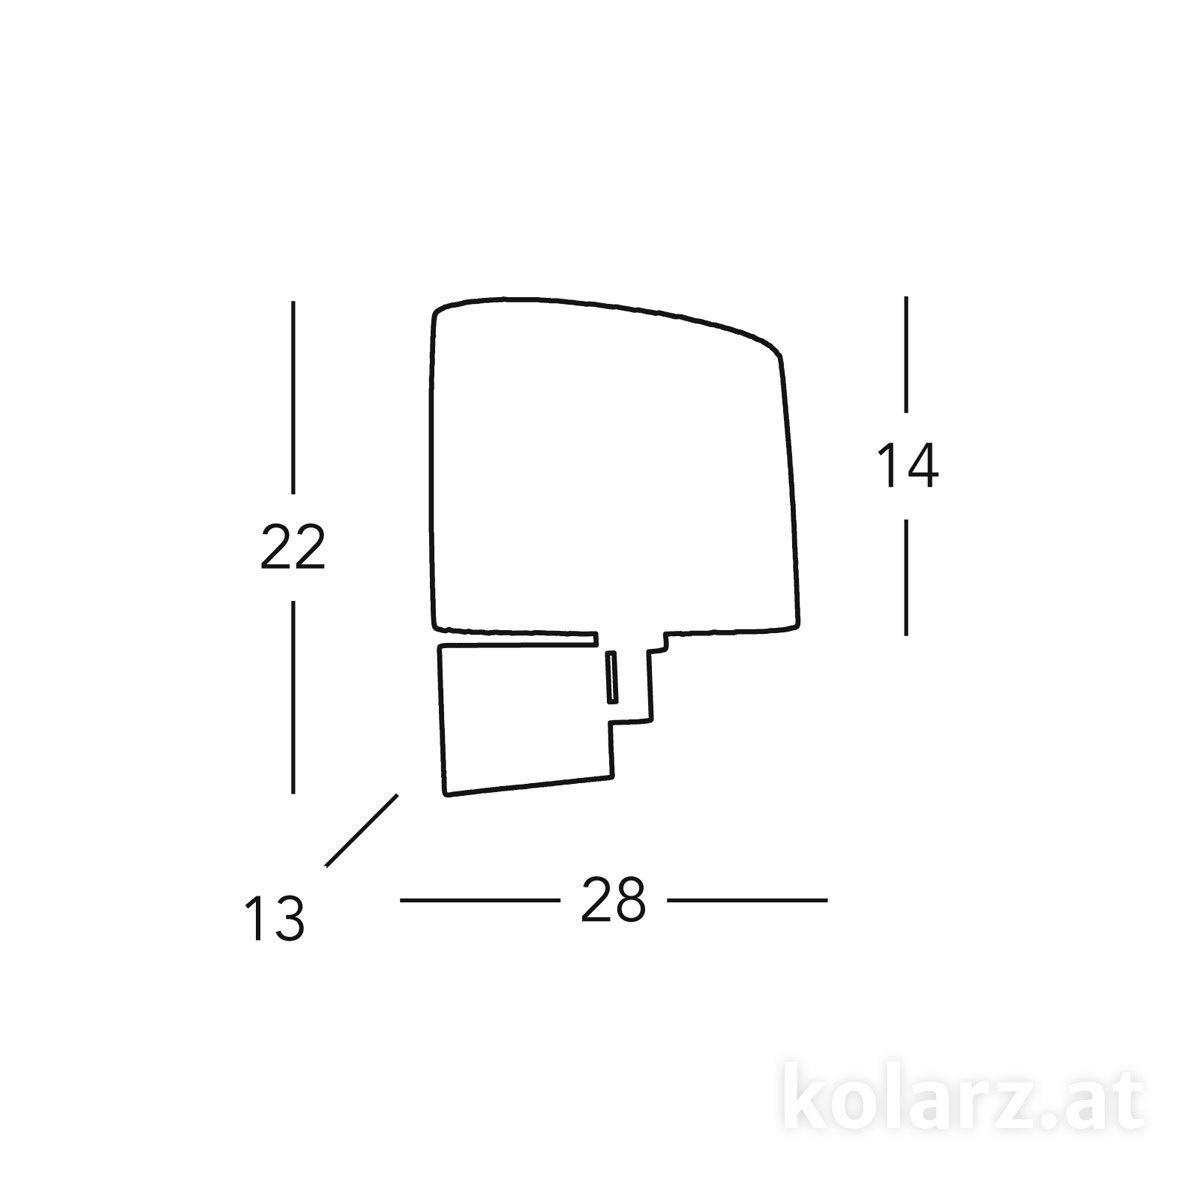 A1307-61-6-s1.jpg